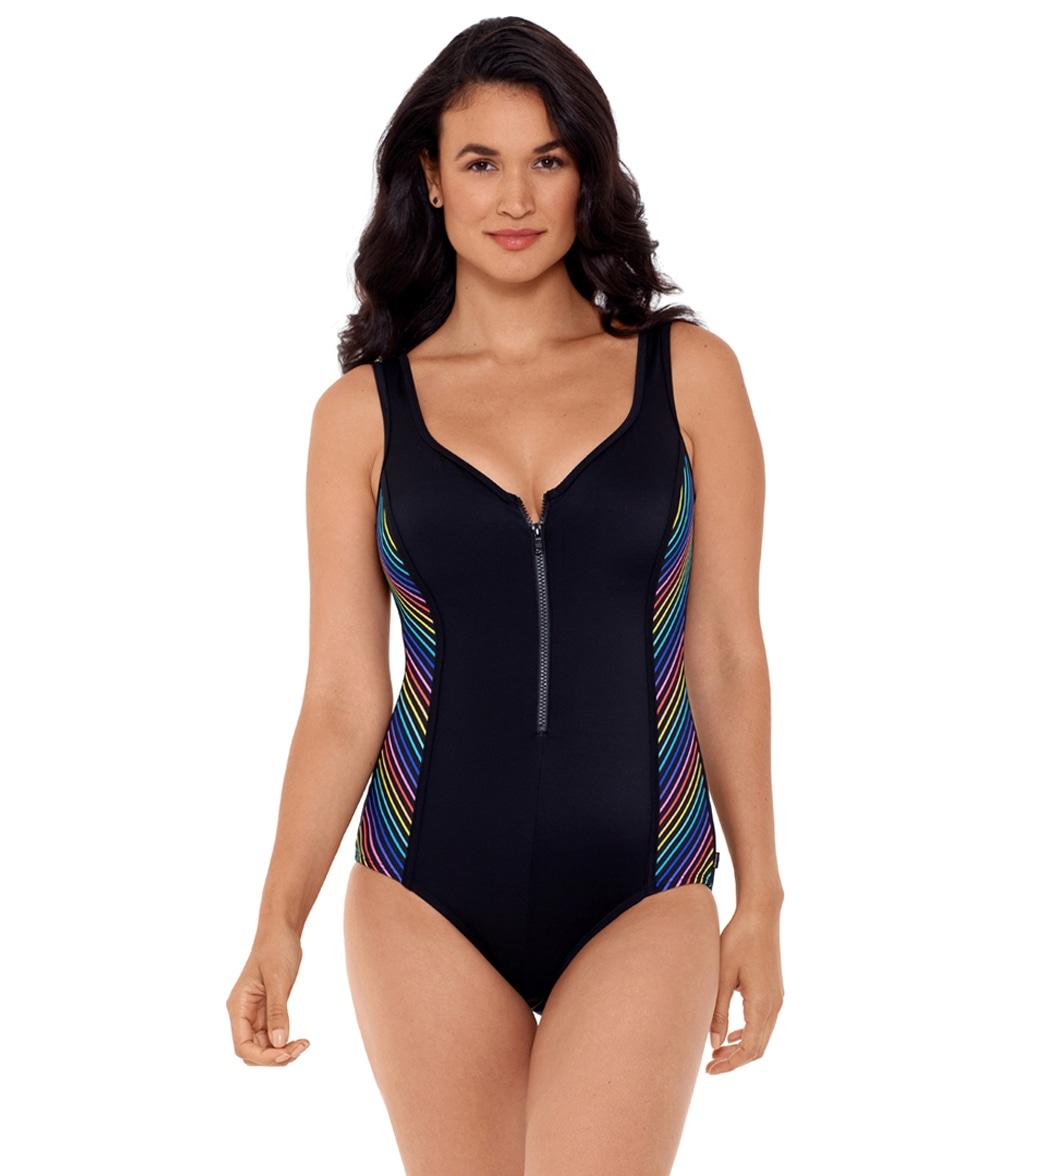 Reebok Women's Our Zips Are Sealed Zipper Tank Chlorine Resistant One Piece Swimsuit